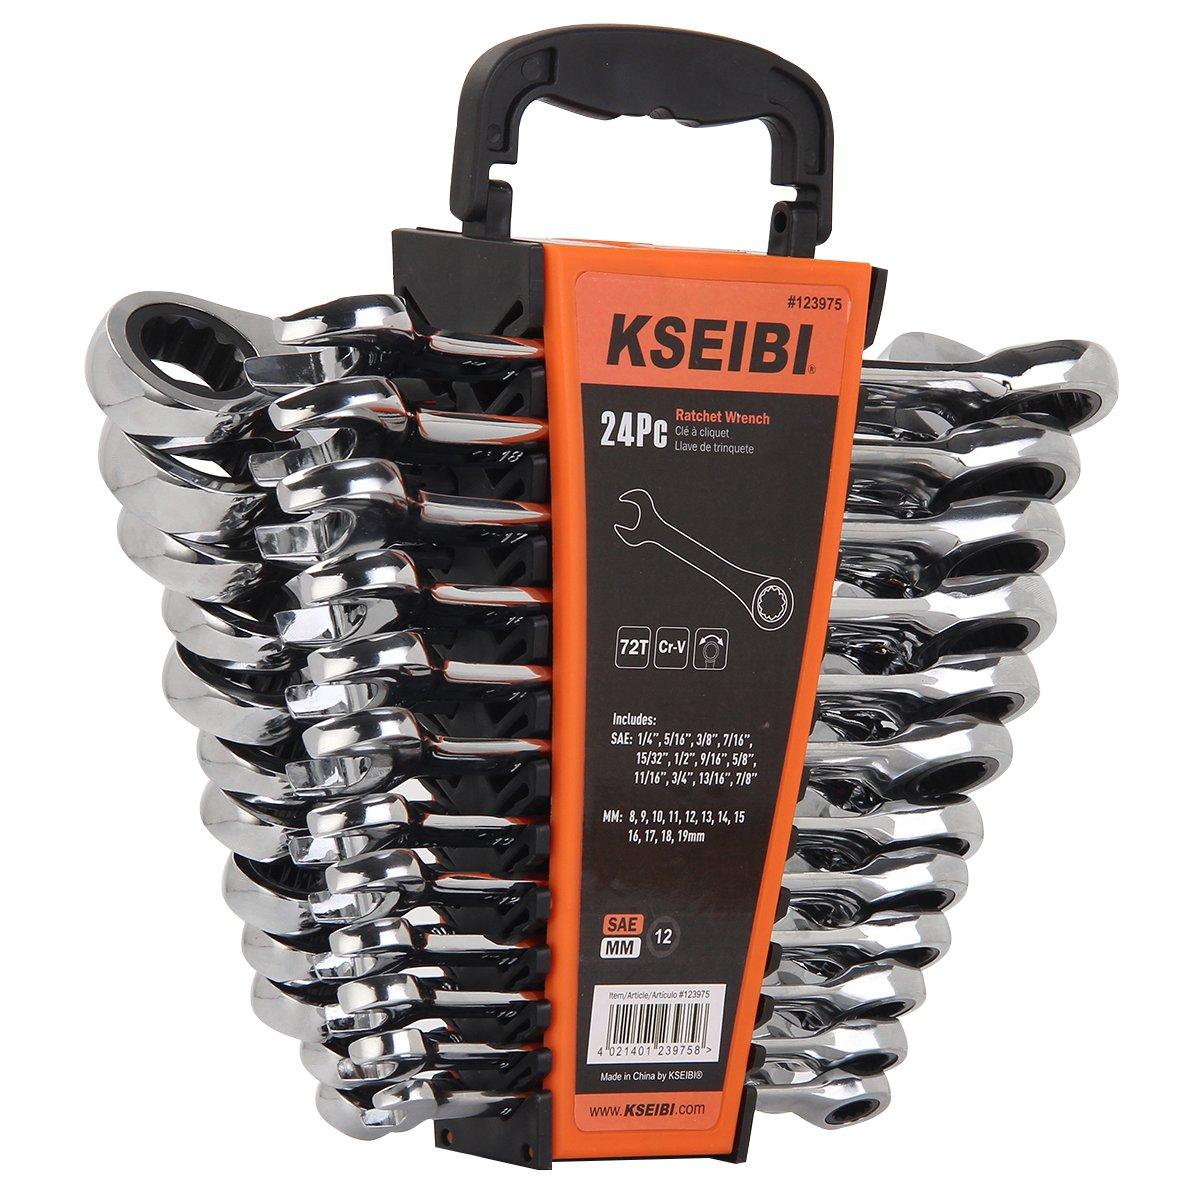 KSEIBI 123975 24 Piece Ratcheting Combination Wrench Set - Chrome Vanadium Steel Ratchet Wrenches Kit with Storage Keeper SAE & Metric by KSEIBI